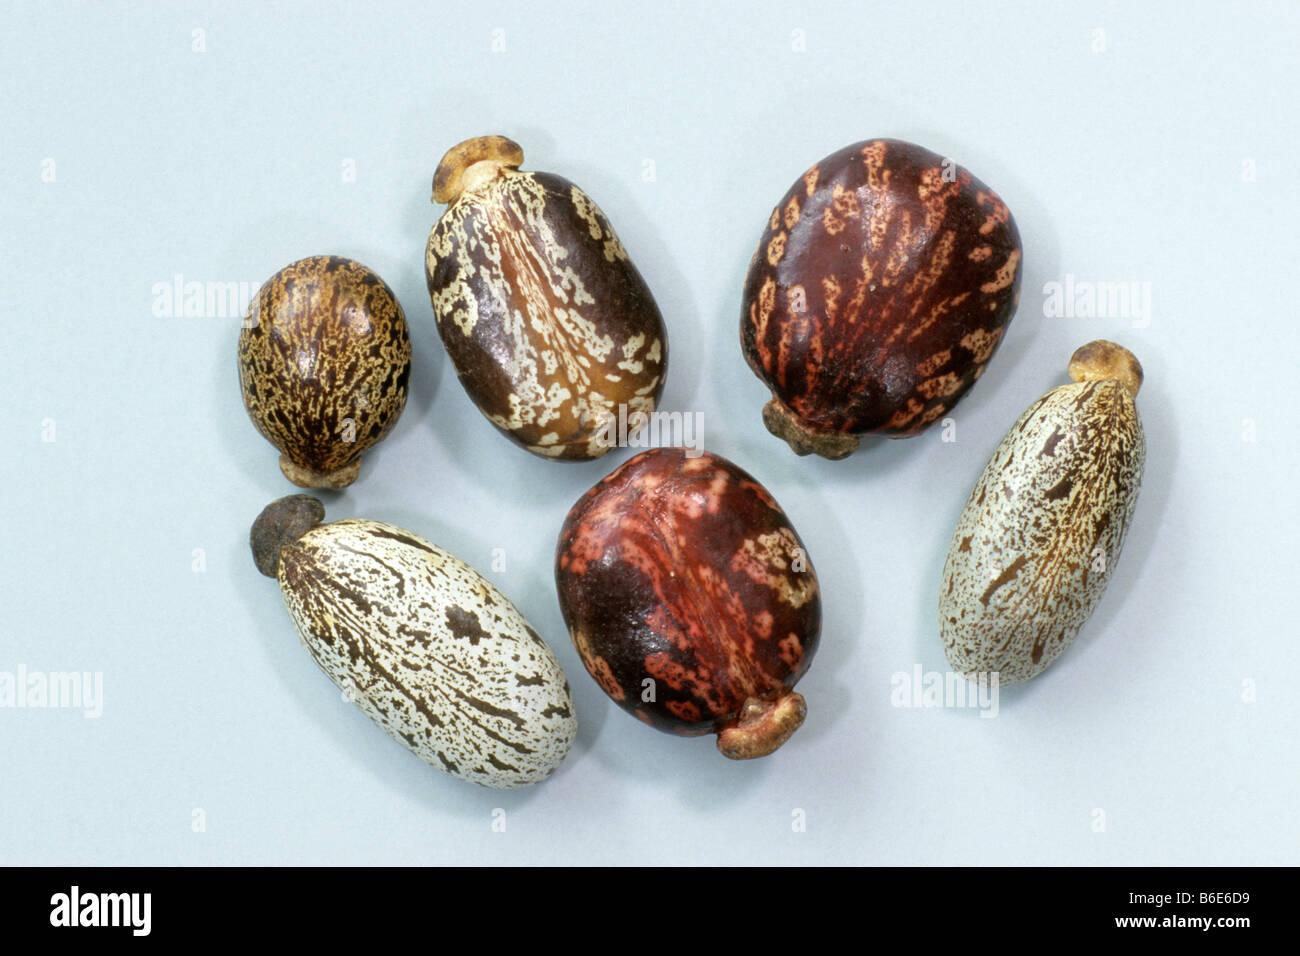 Castor Oil Plant Ricinus Communis Seeds Studio Picture Stock Photo Alamy